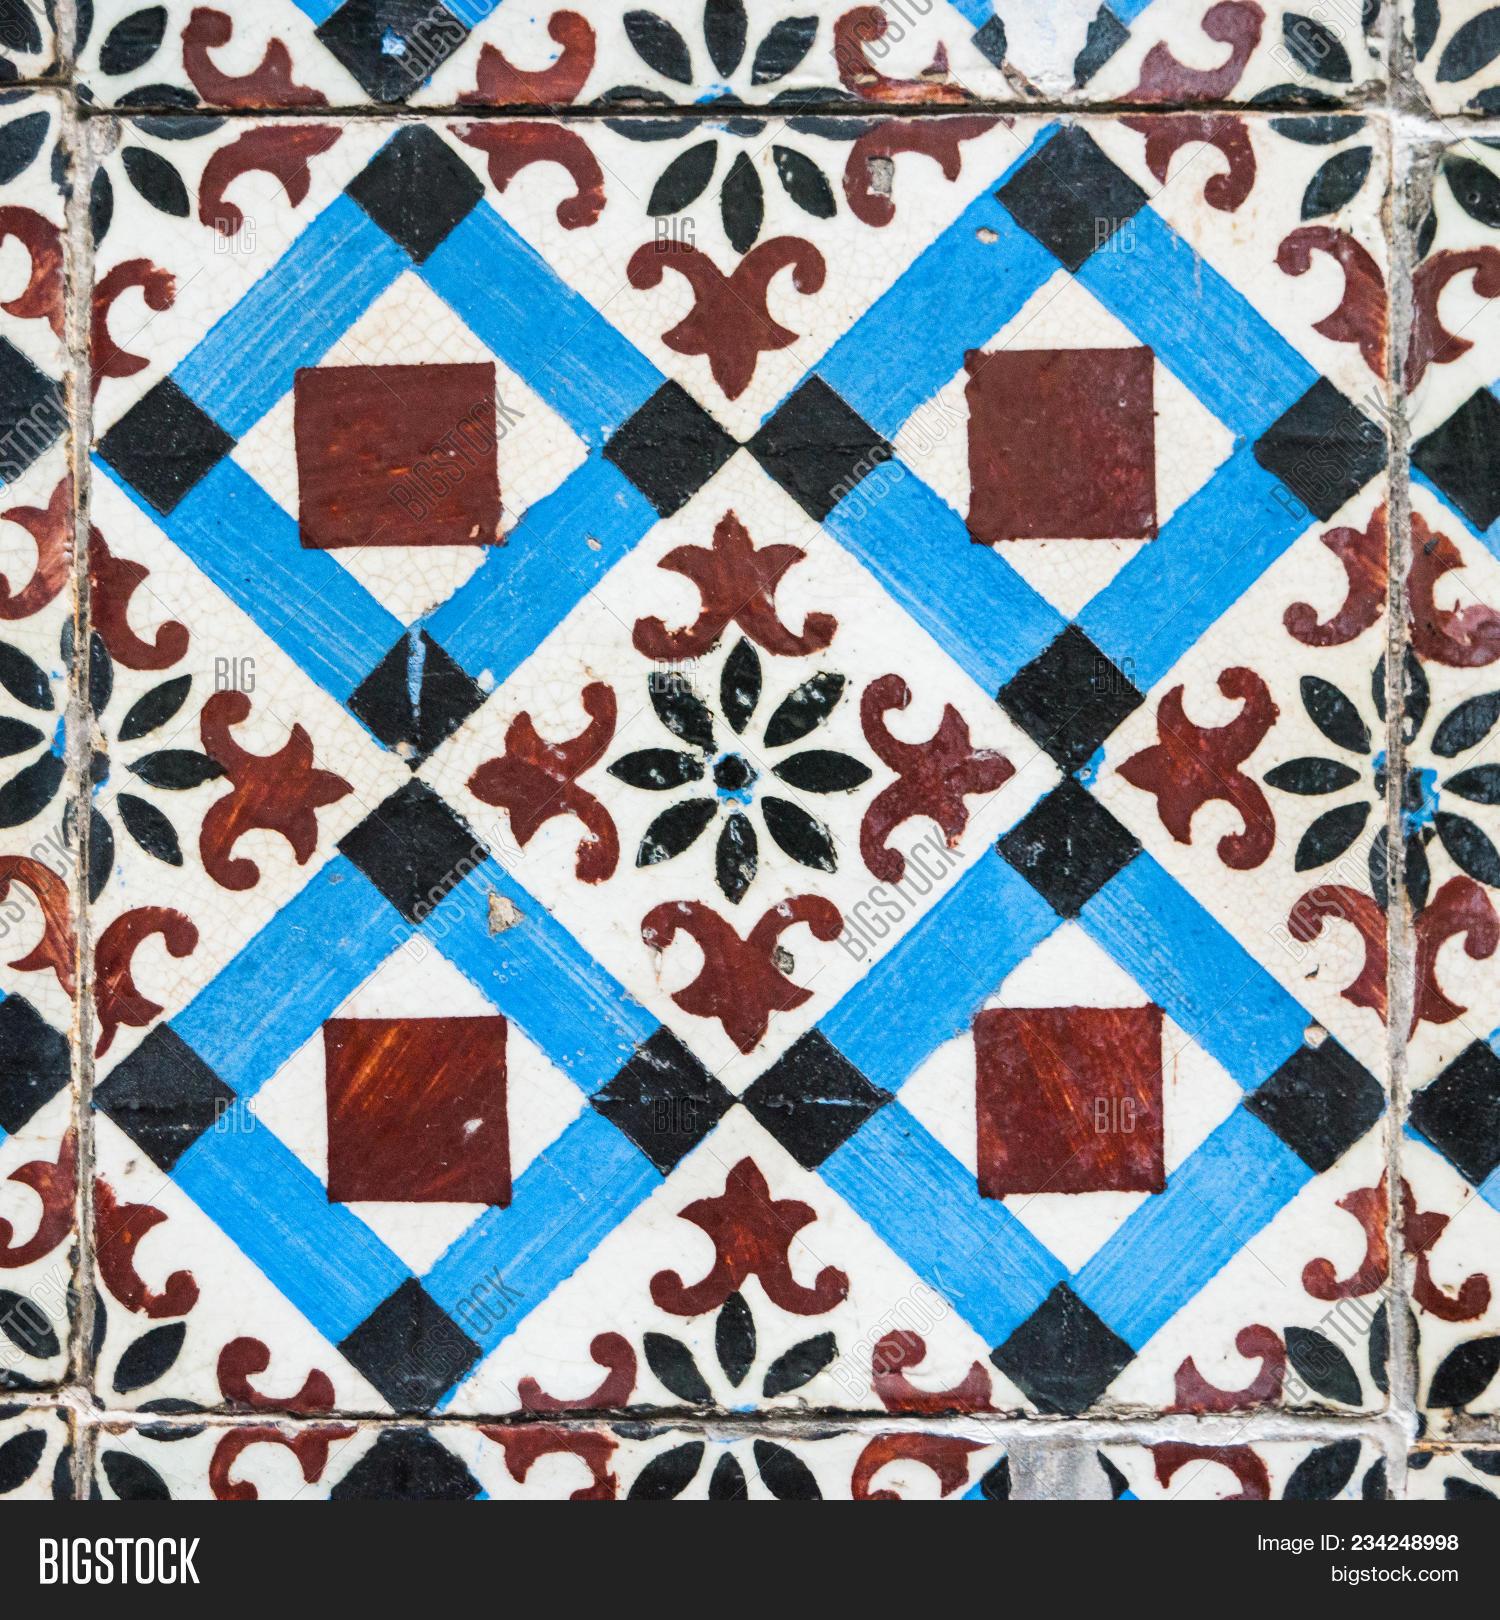 Old Ceramic Tiles Image Photo Free Trial Bigstock